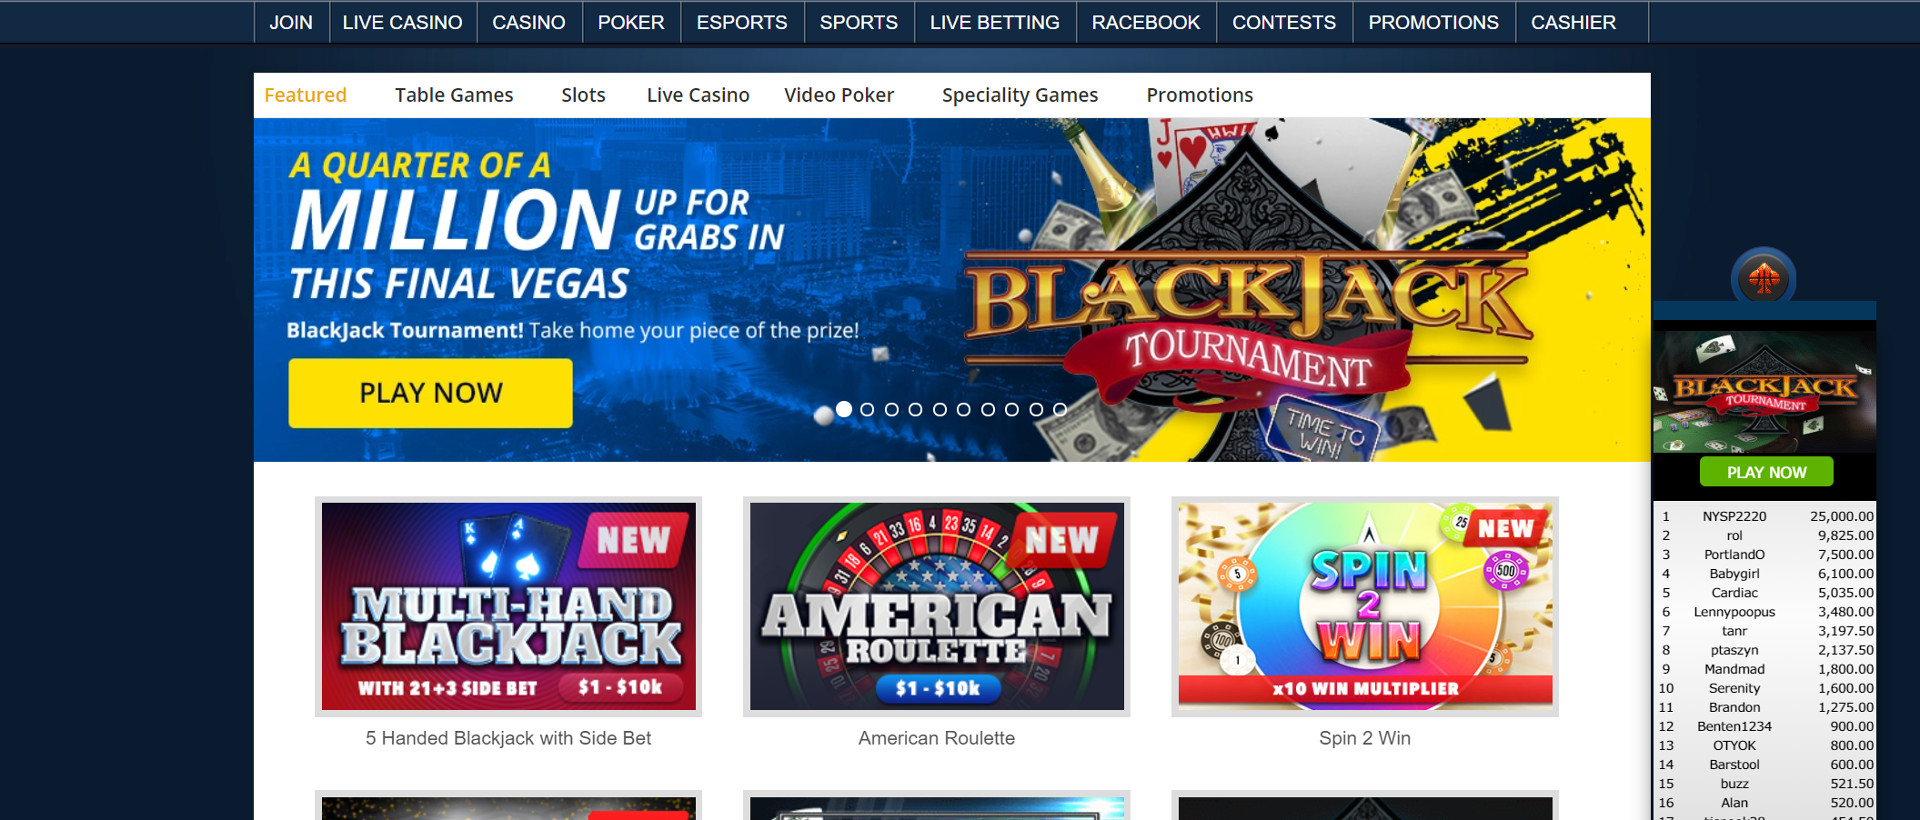 Sports betting coupon code joelmir betting bloggers